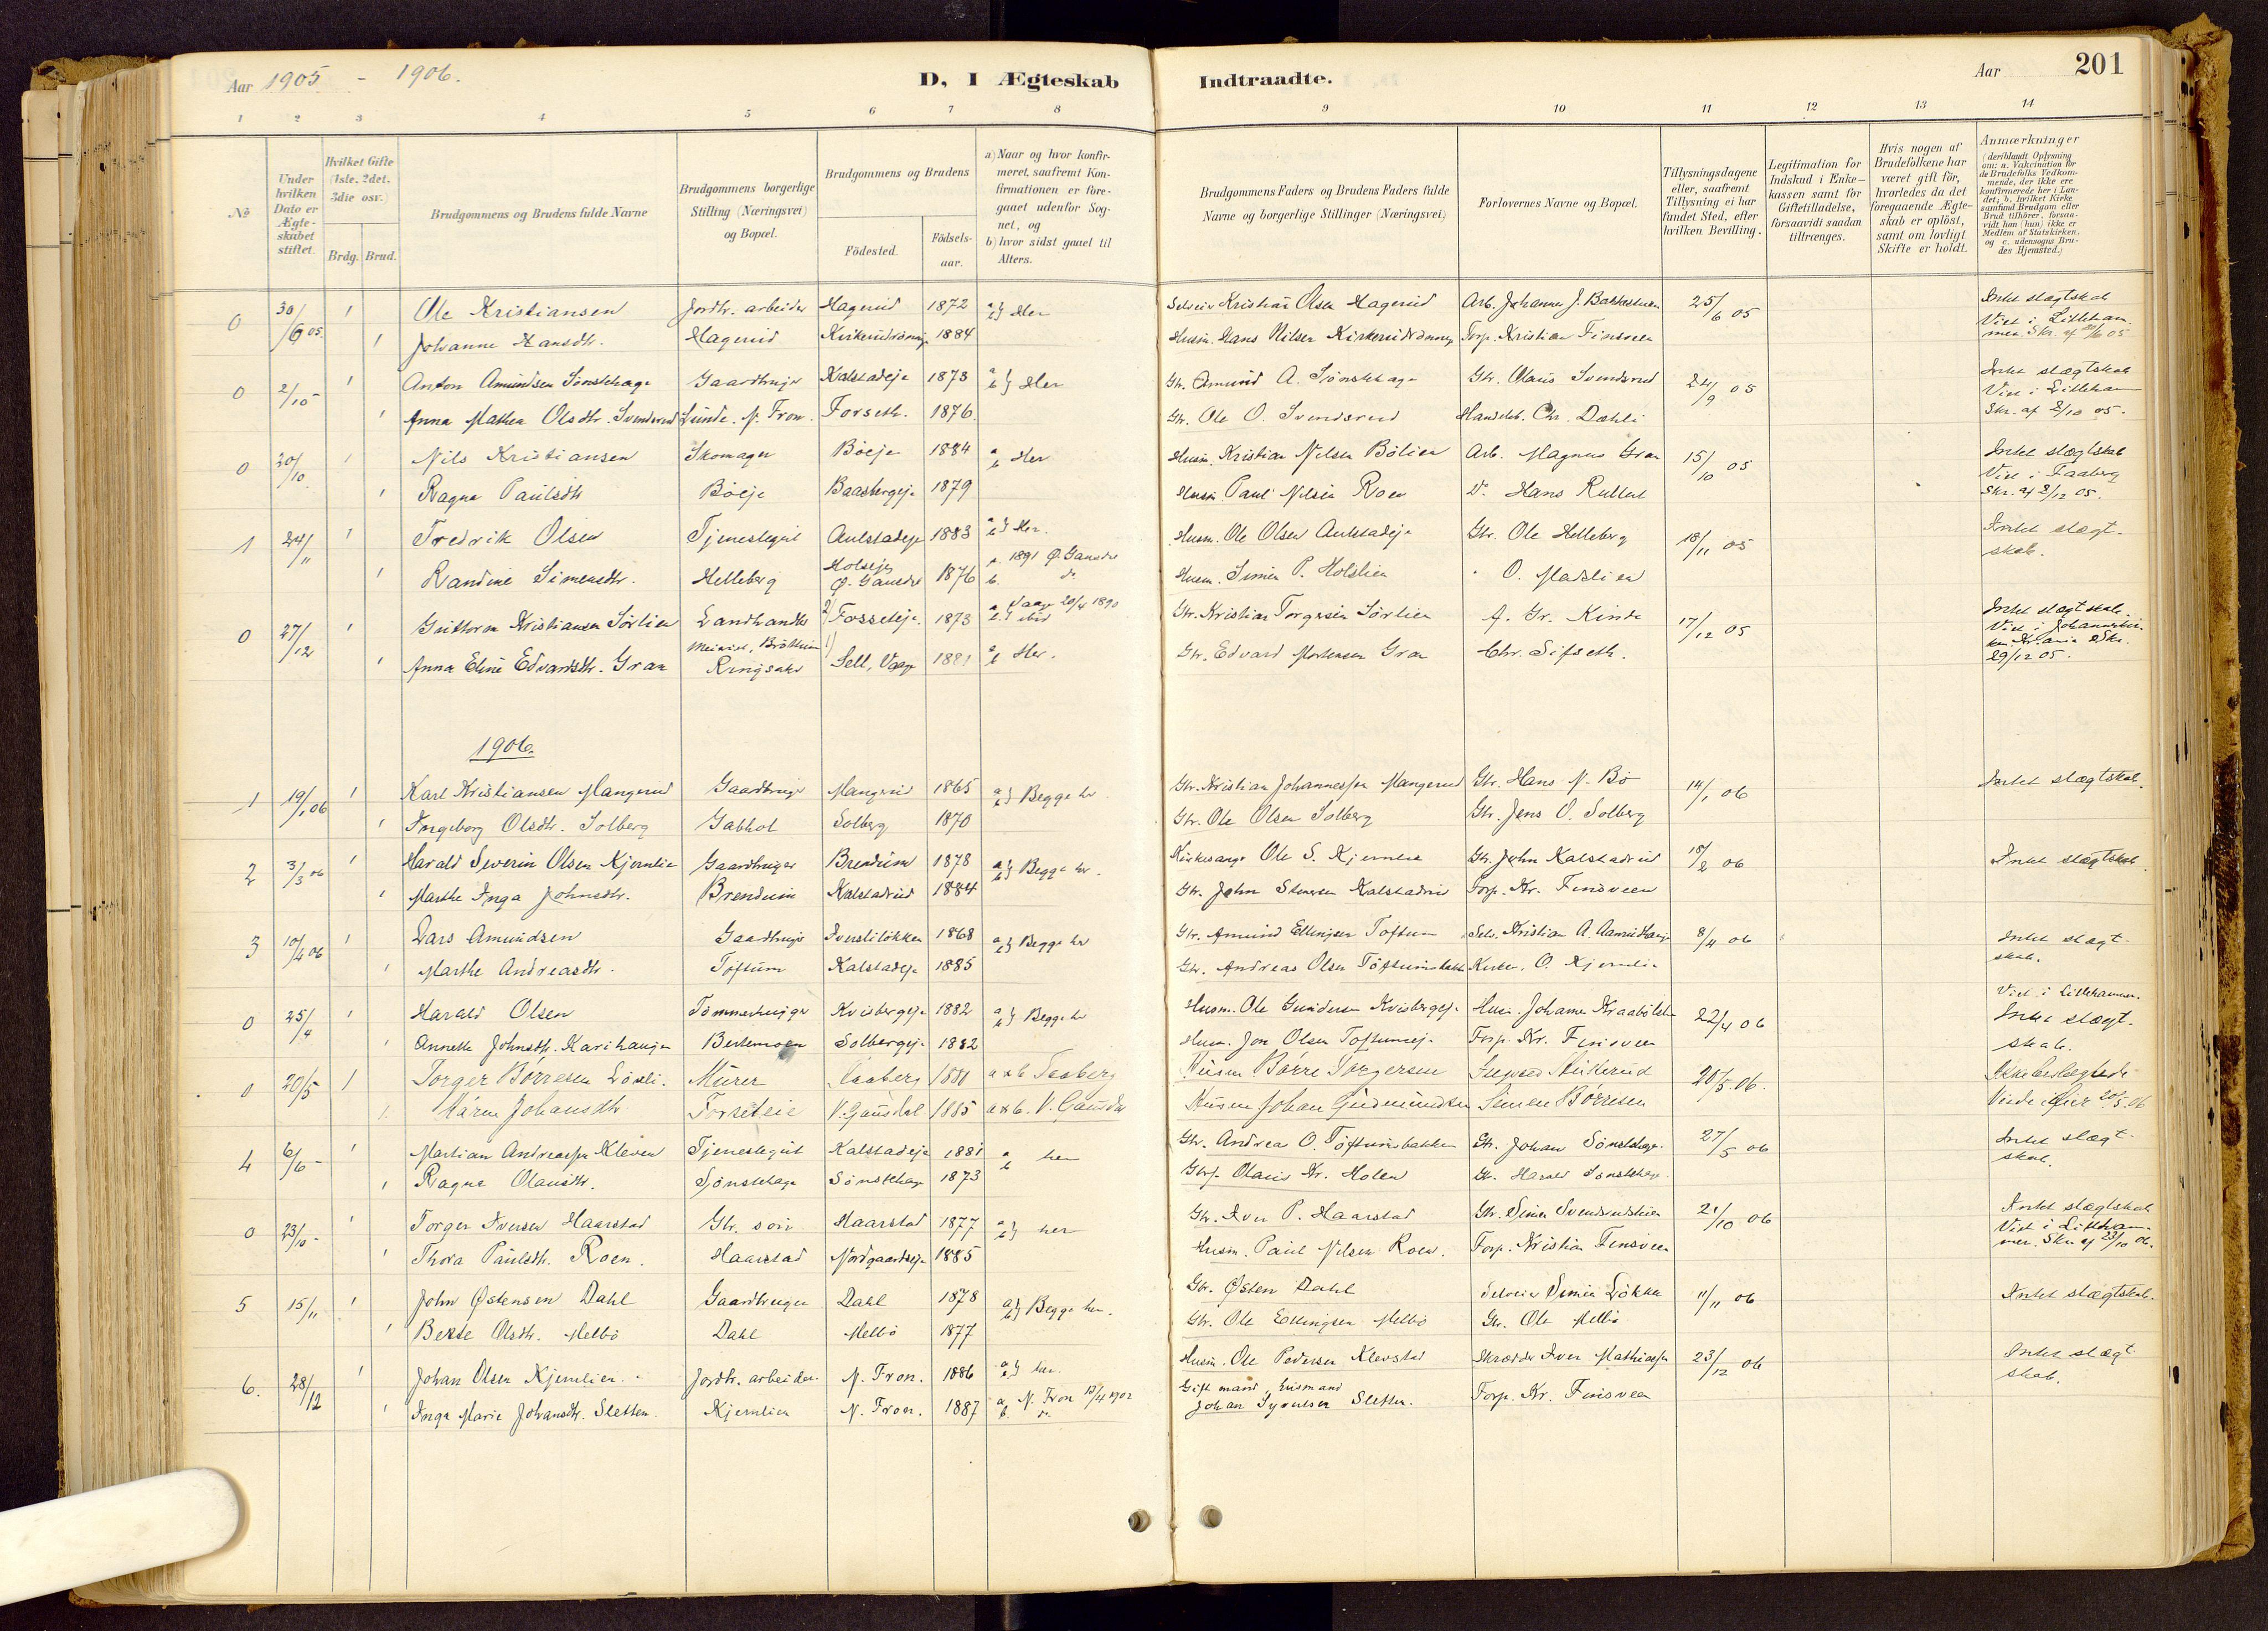 SAH, Vestre Gausdal prestekontor, Ministerialbok nr. 1, 1887-1914, s. 201